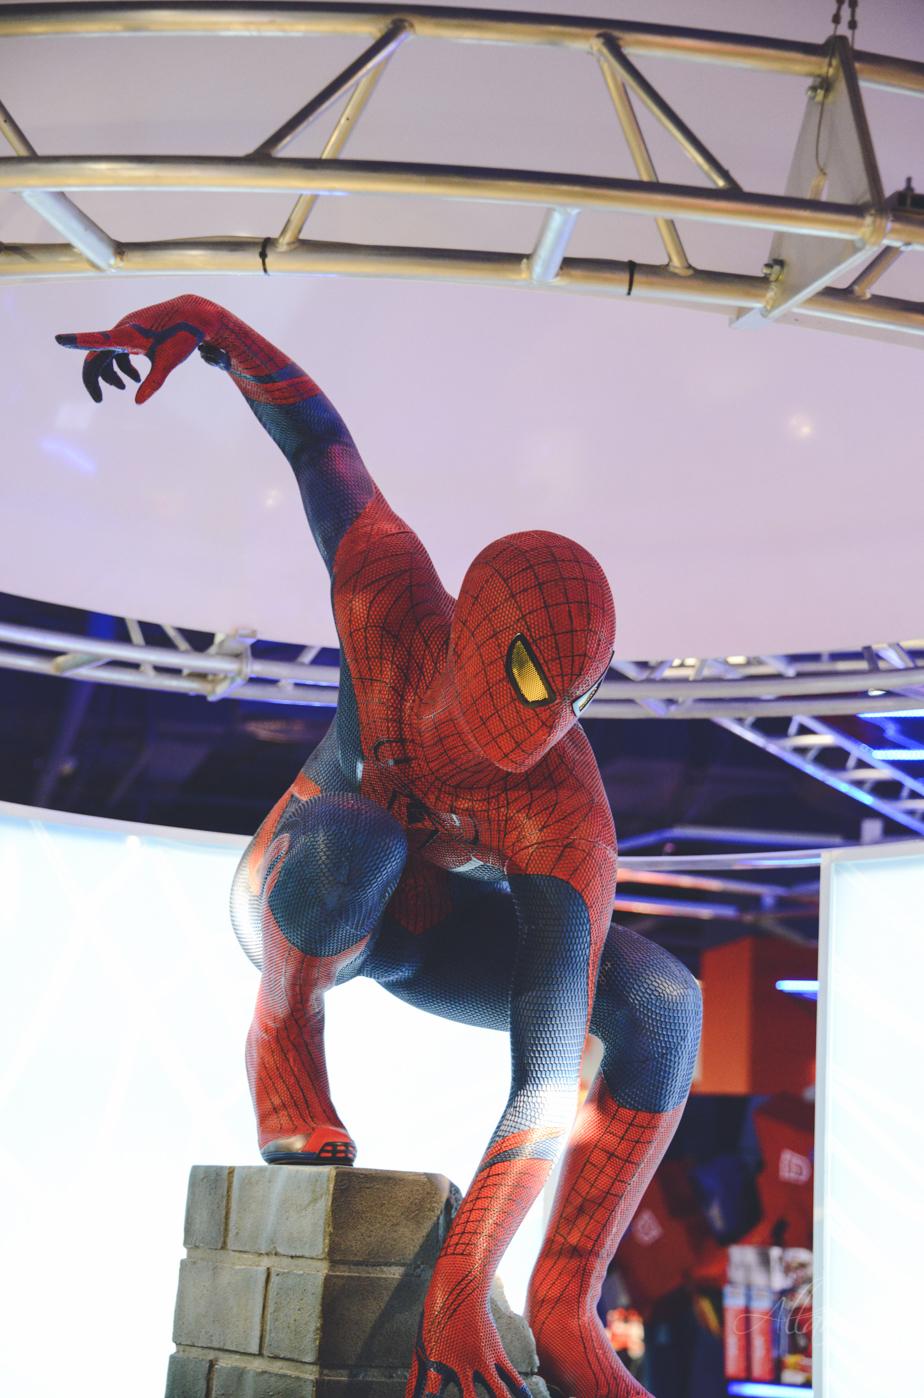 Spiderman in Detsky Mir shop